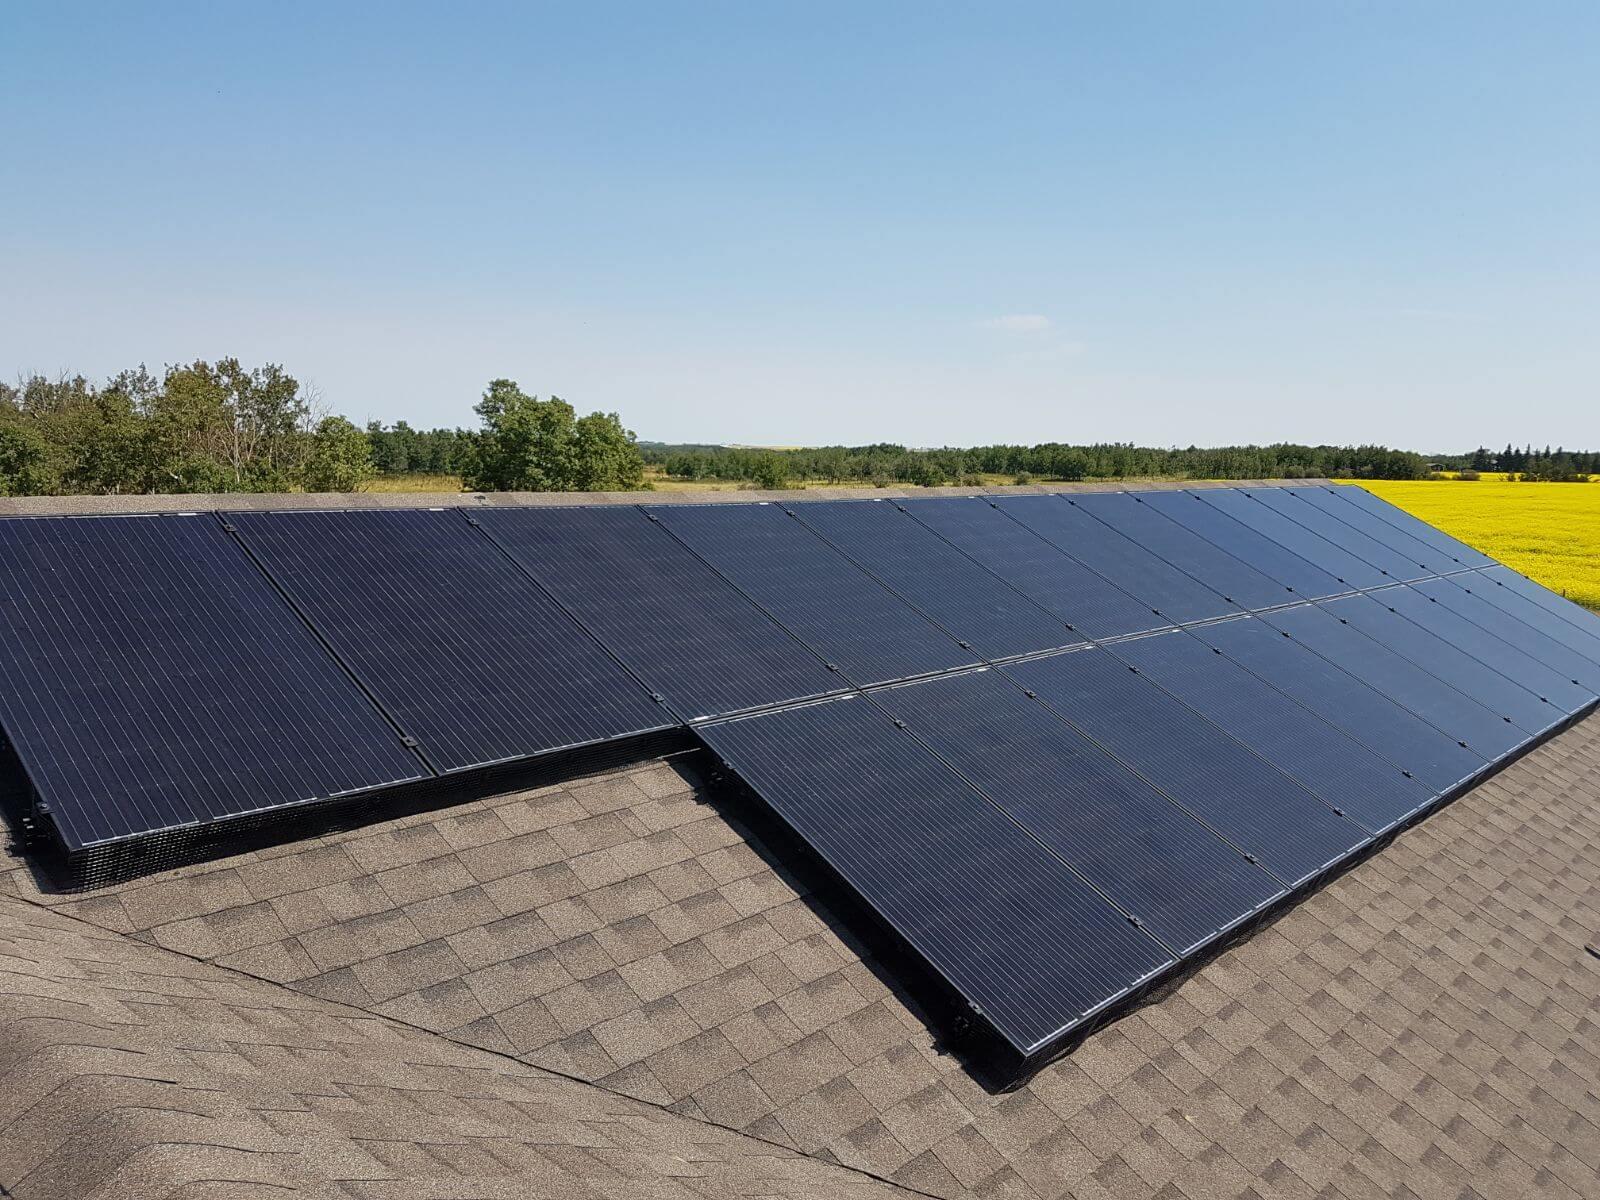 6.4 kw solar array camrose county pic 3